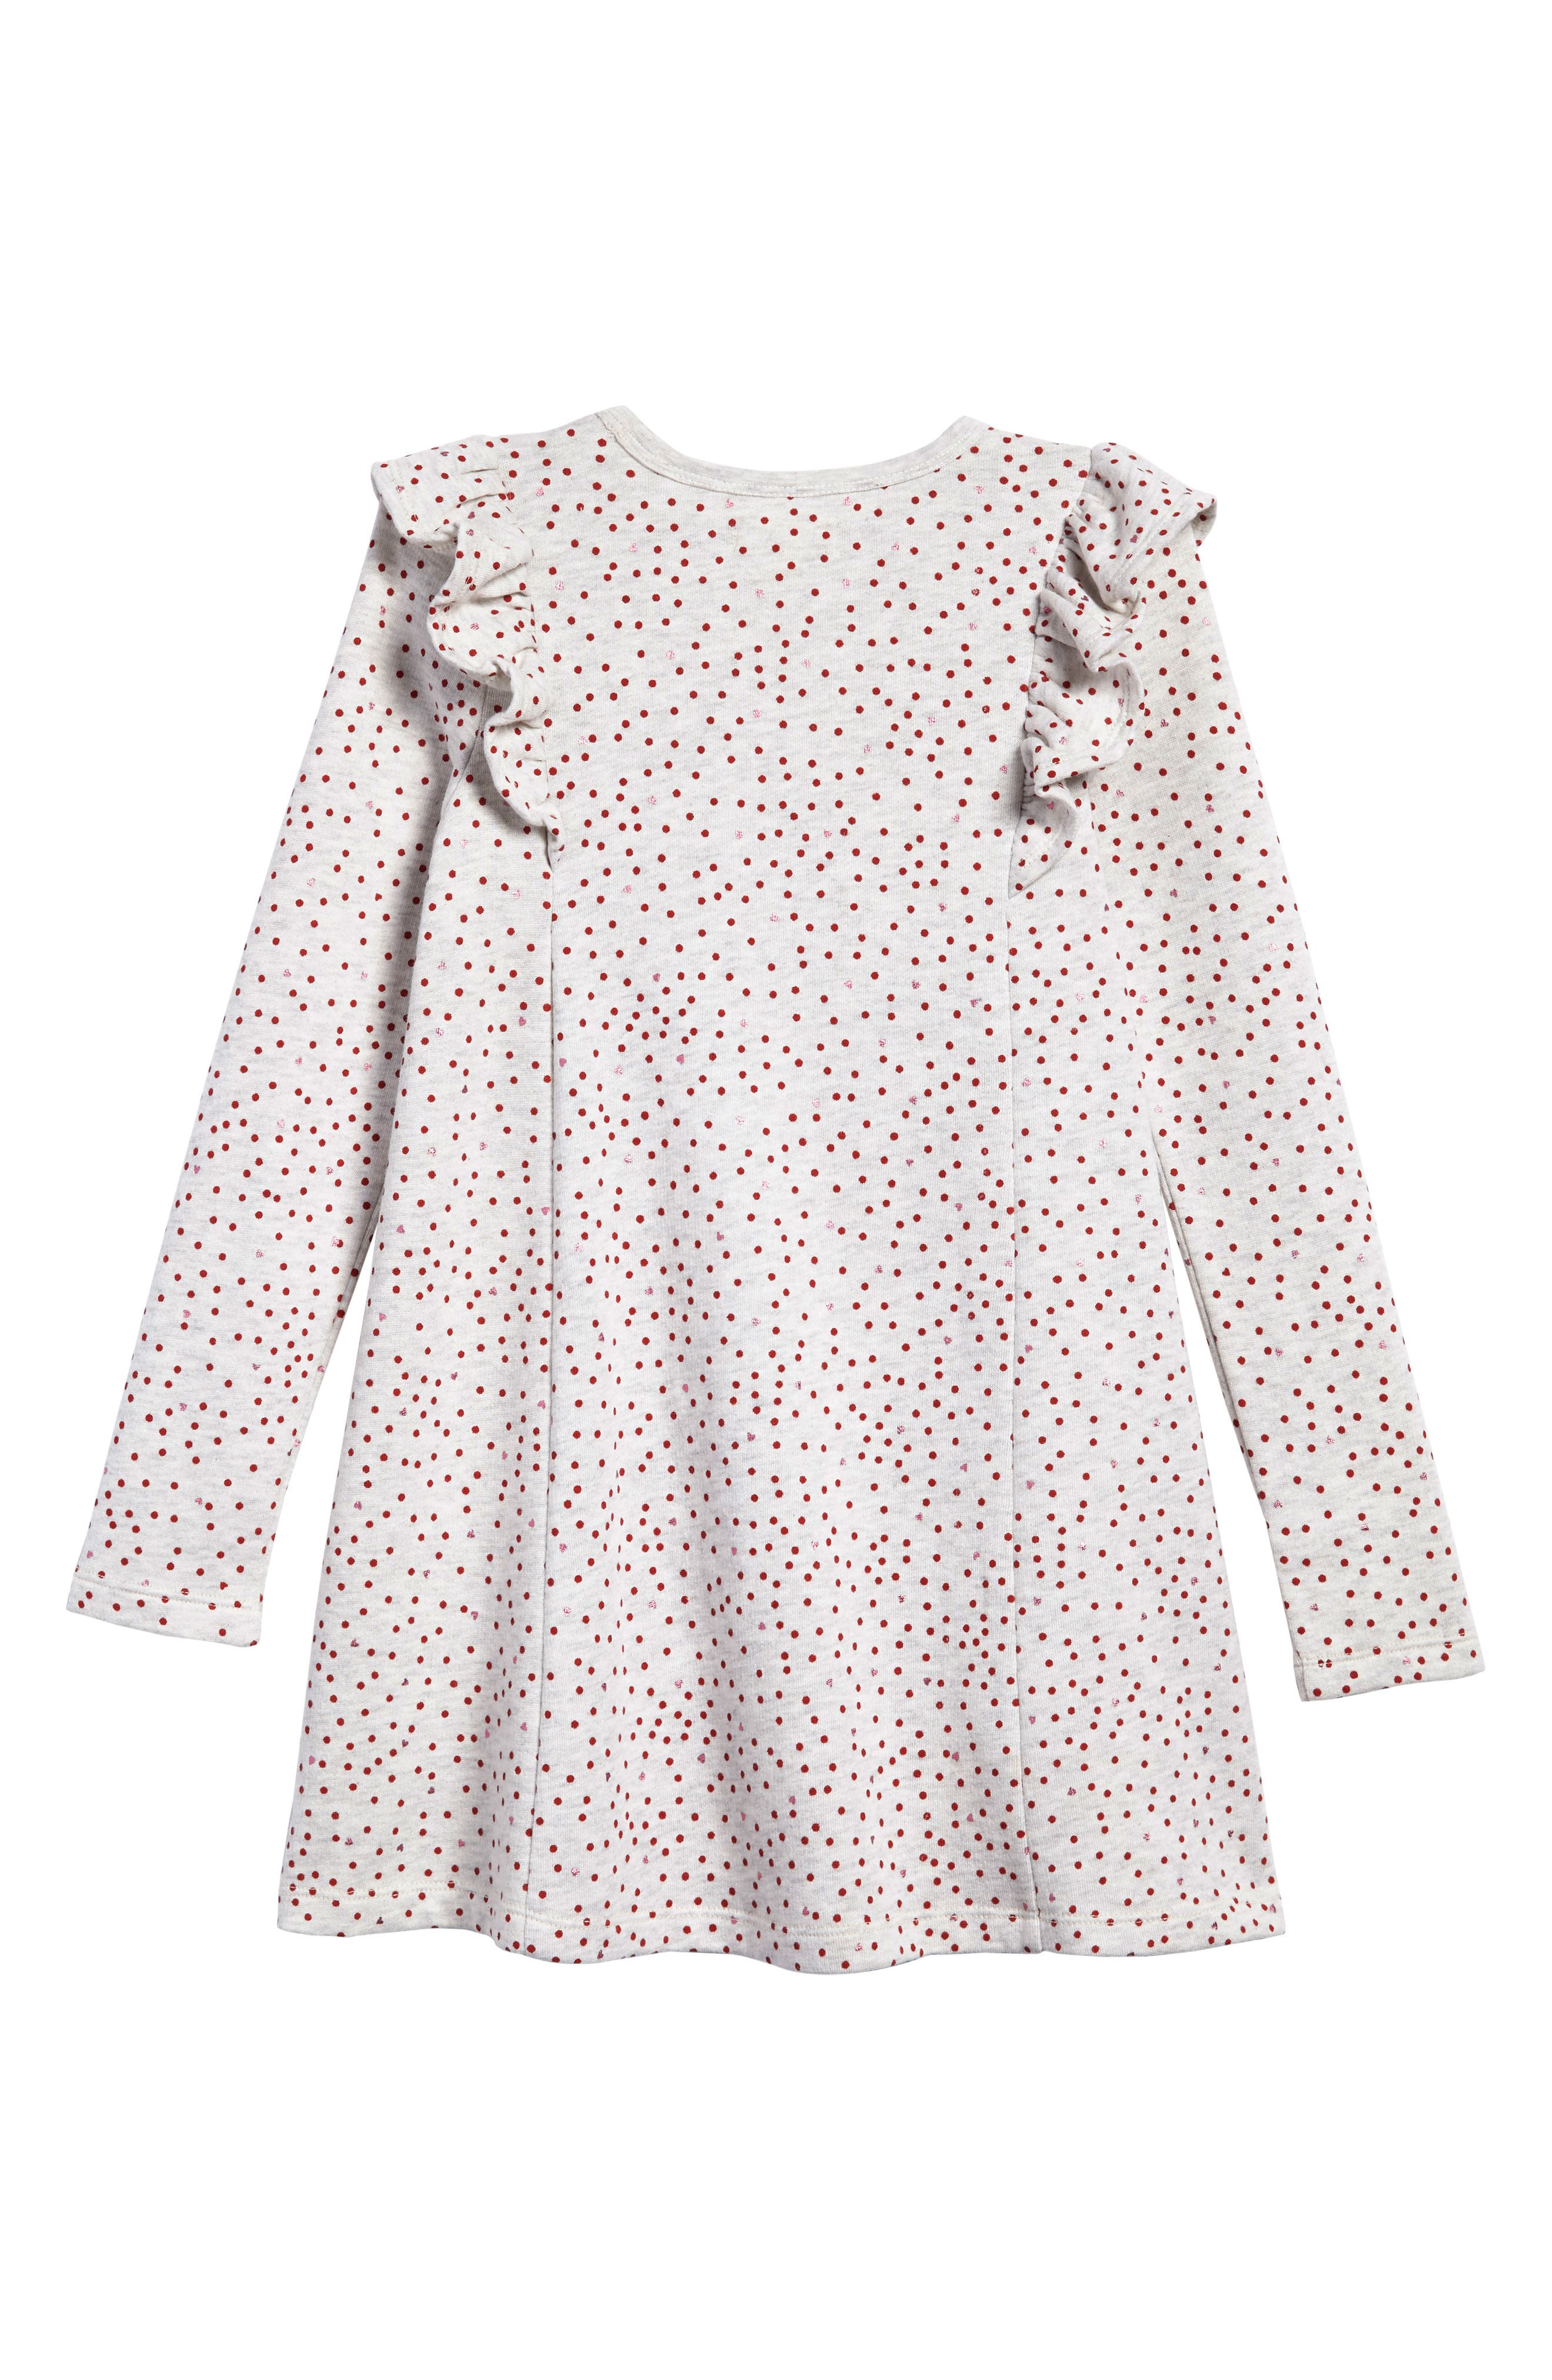 Main Image - Tucker + Tate Ruffle Fleece Sweater Dress (Toddler Girls, Little Girls & Big Girls)